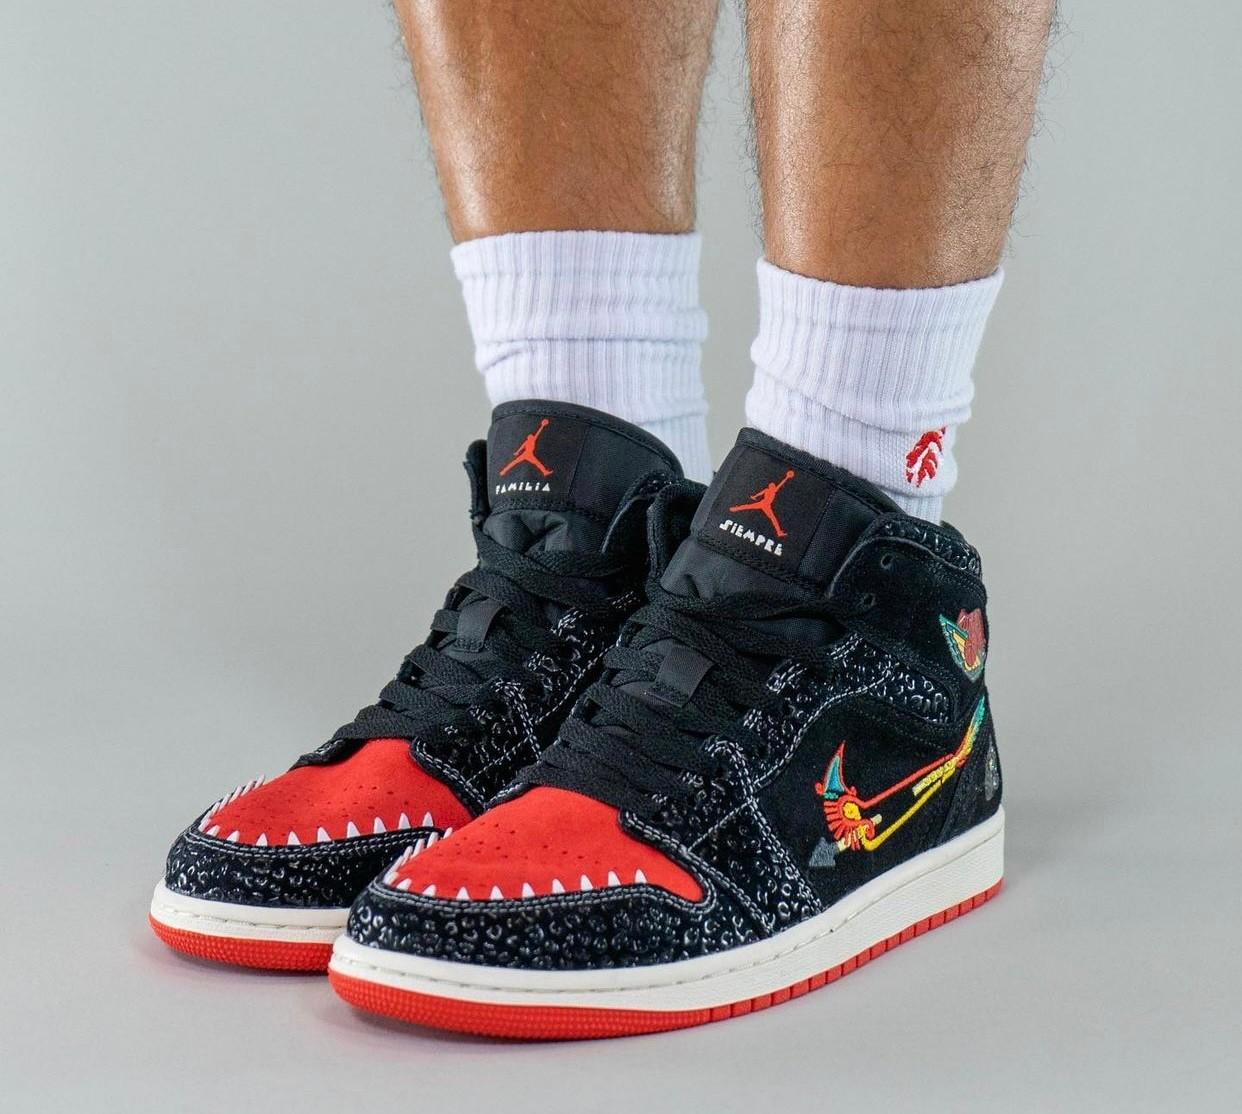 AJ,Air Jordan 1 Mid,Siempre Fa  浓郁「亡灵节」气氛!全新 Air Jordan 1 Mid 上脚图曝光!